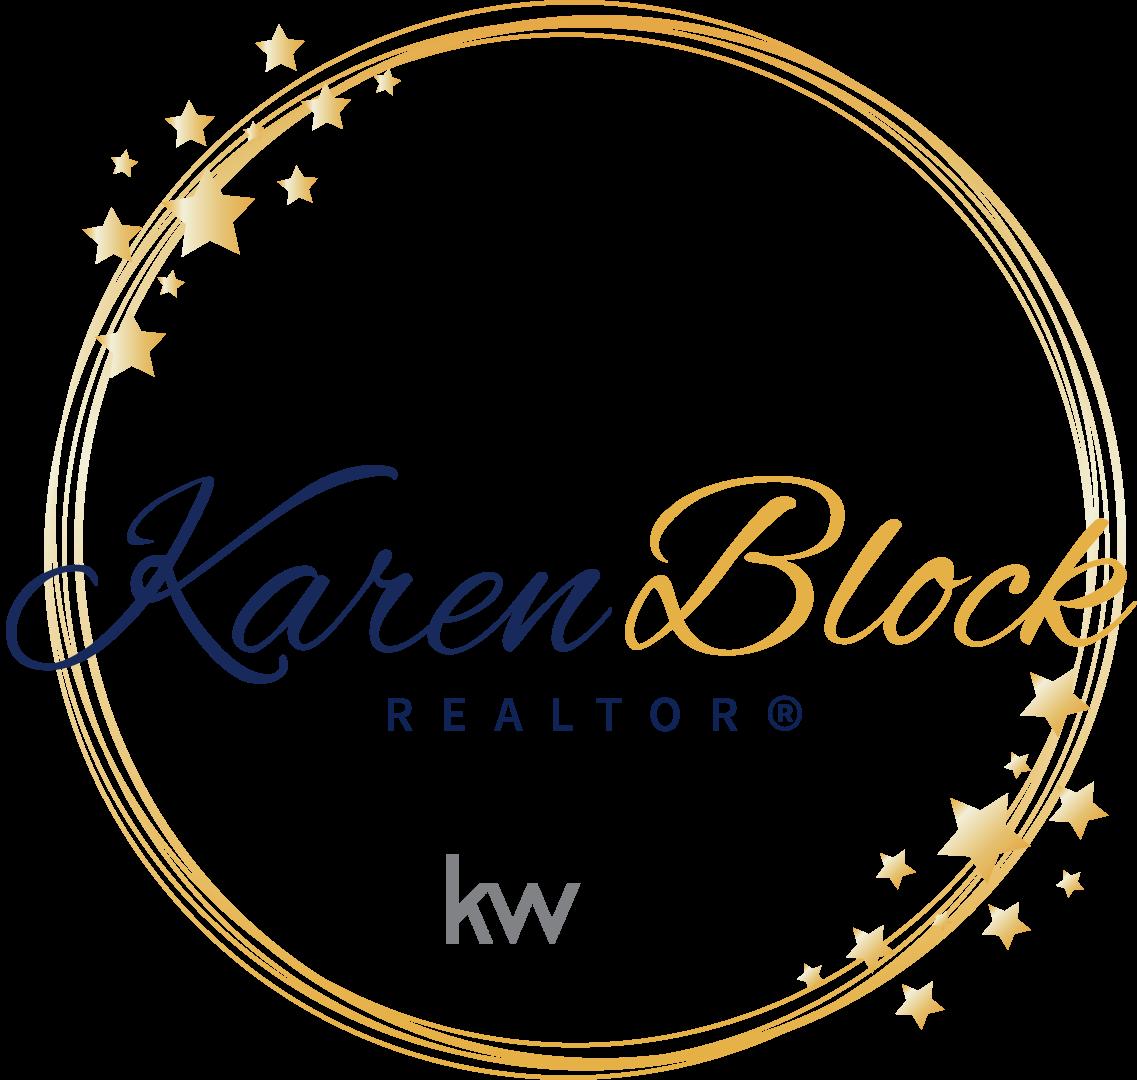 Karen Block